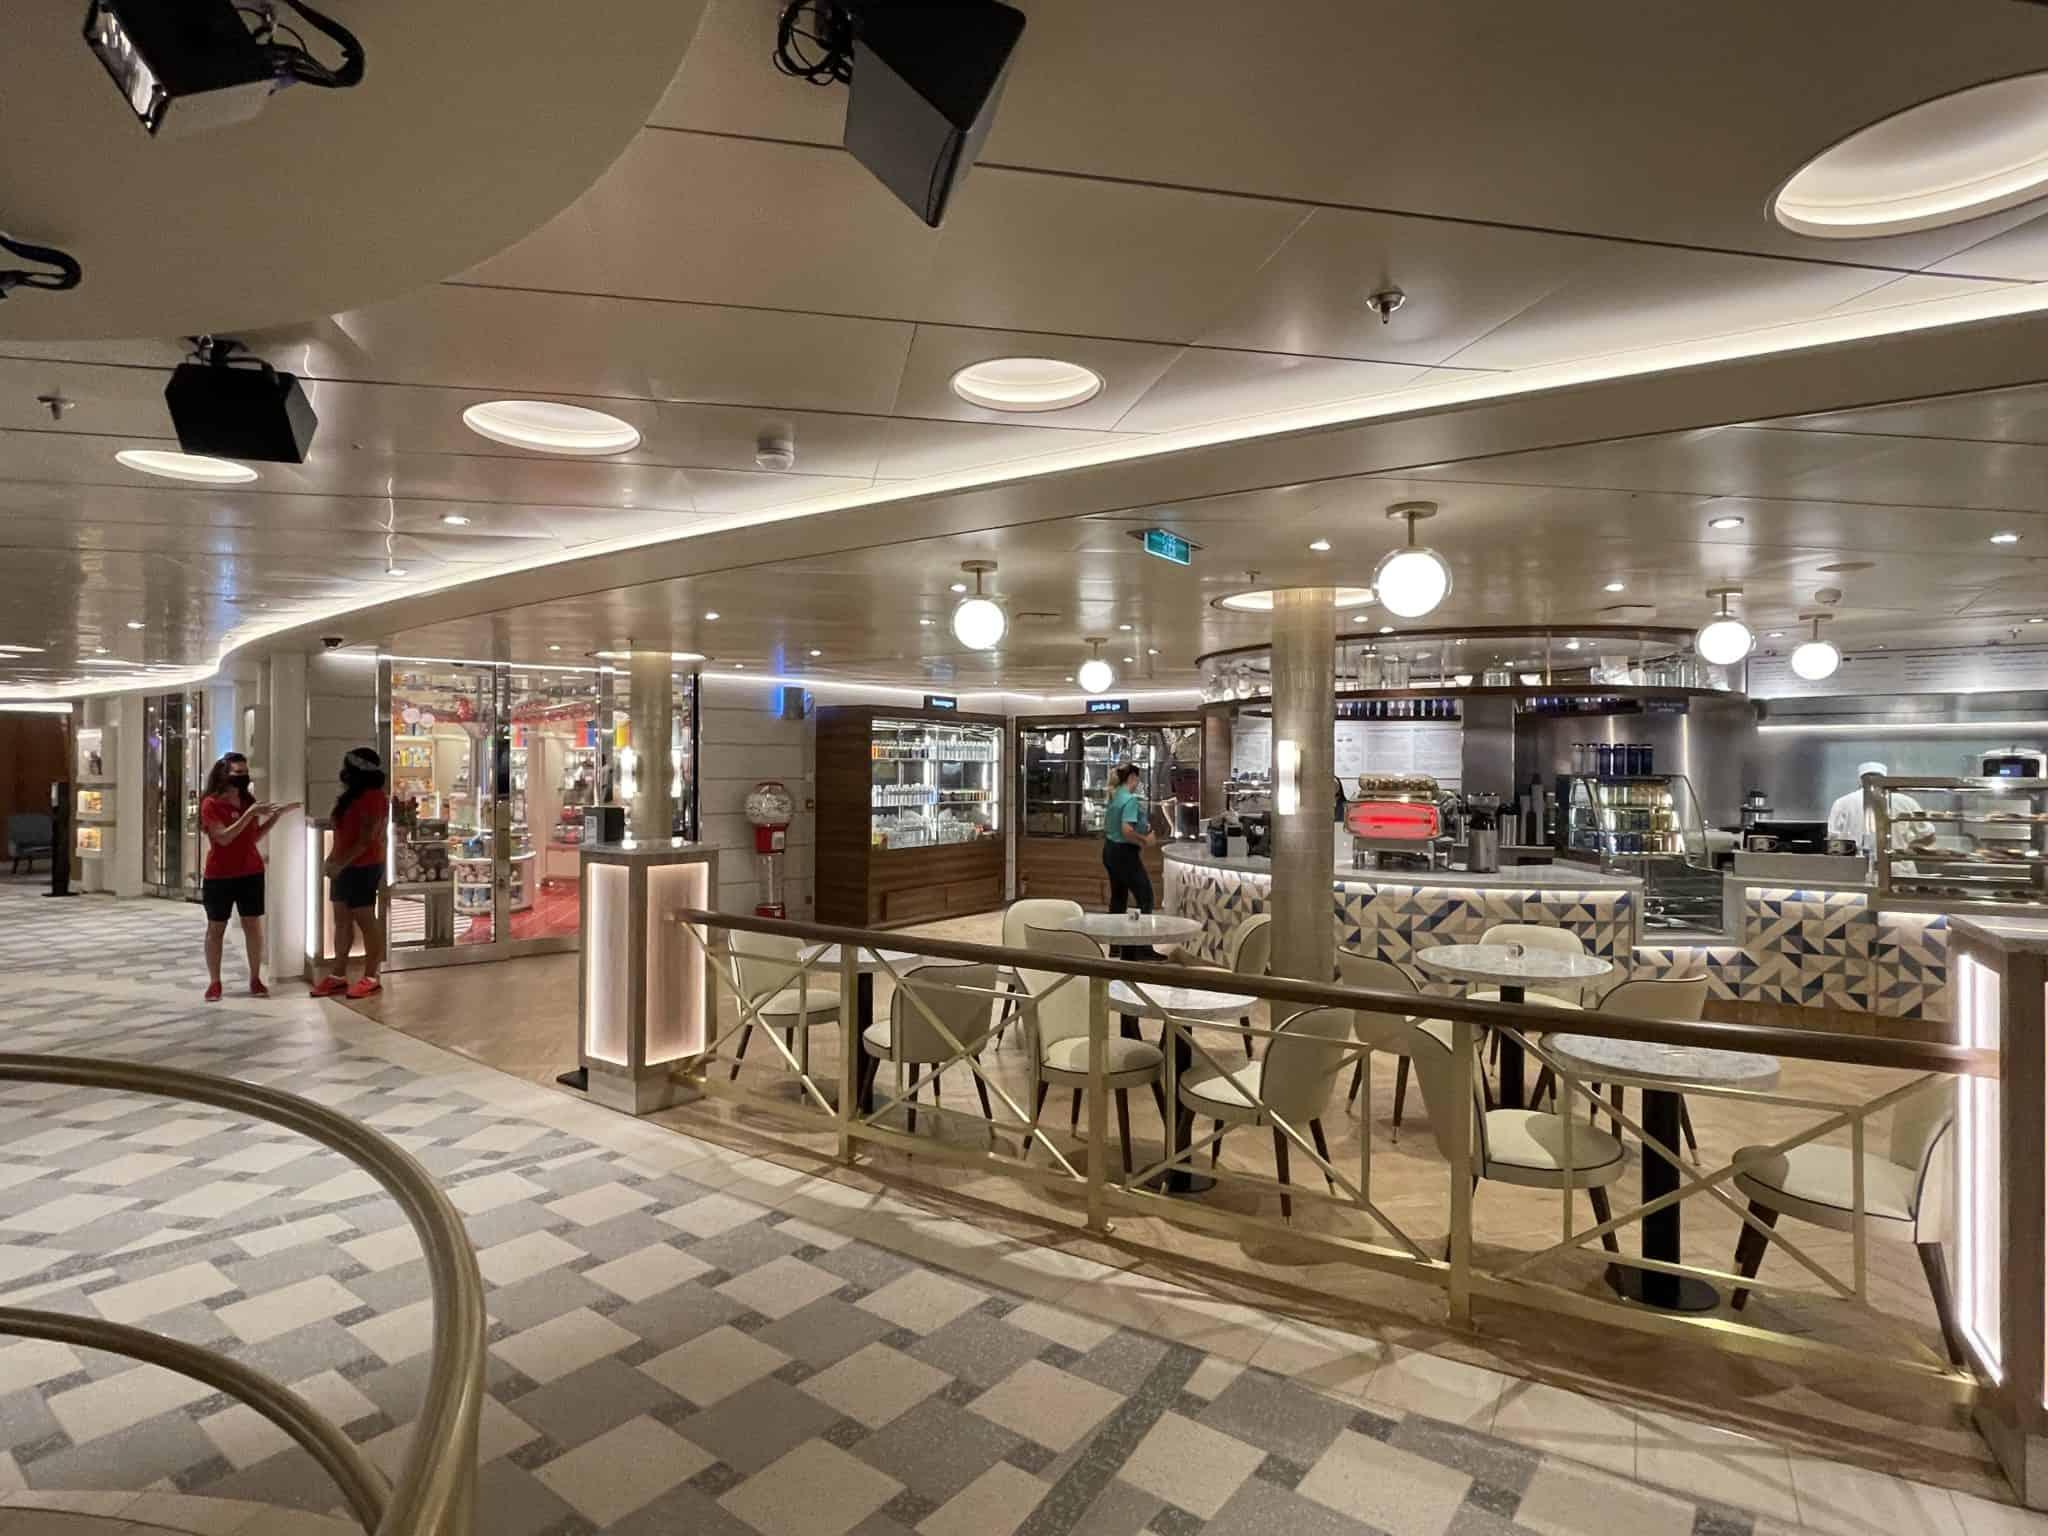 javablue cafe mardi gras carnival cruise